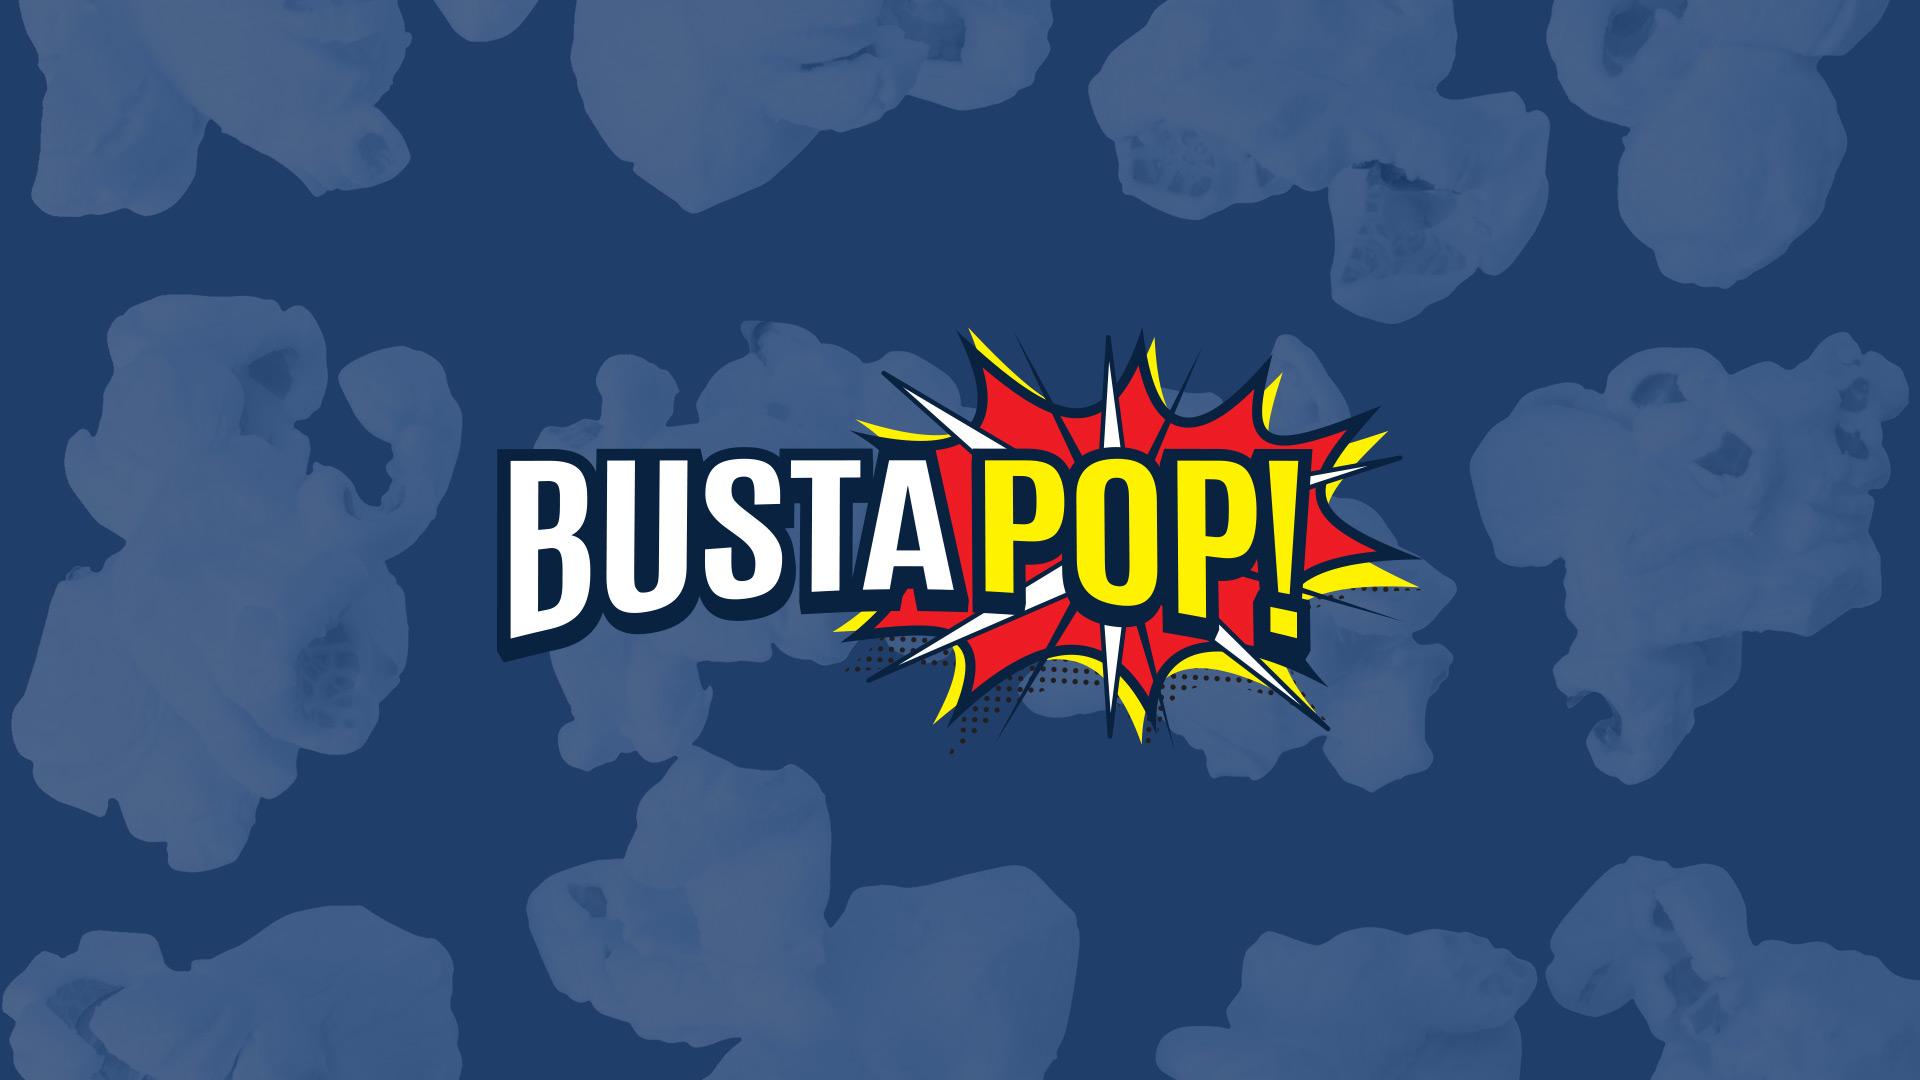 bustapop_1920x1080-logo.jpg